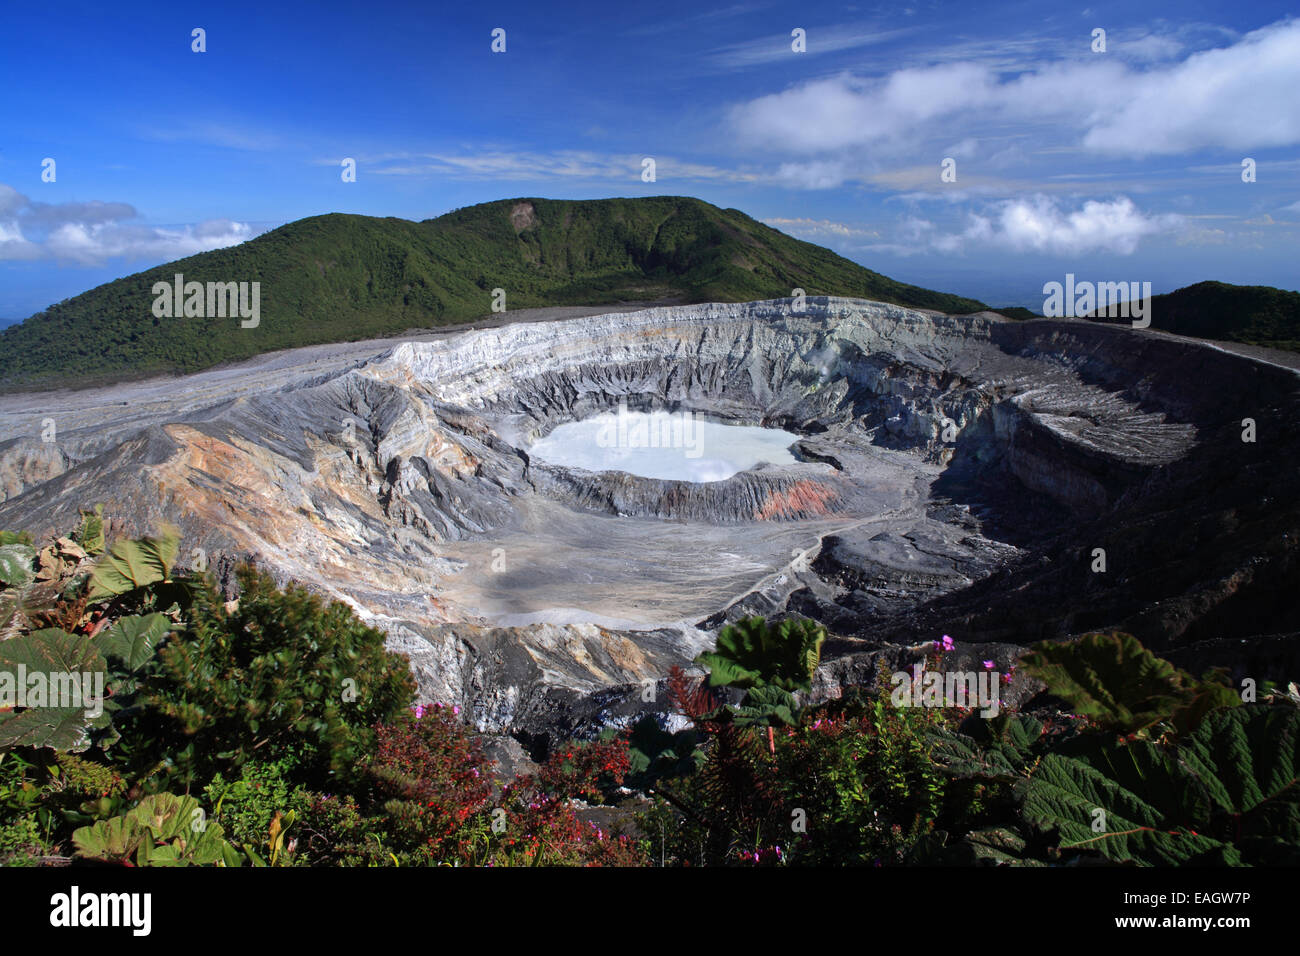 Active Crater of Poas Volcano, Alajuela, Costa Rica. - Stock Image